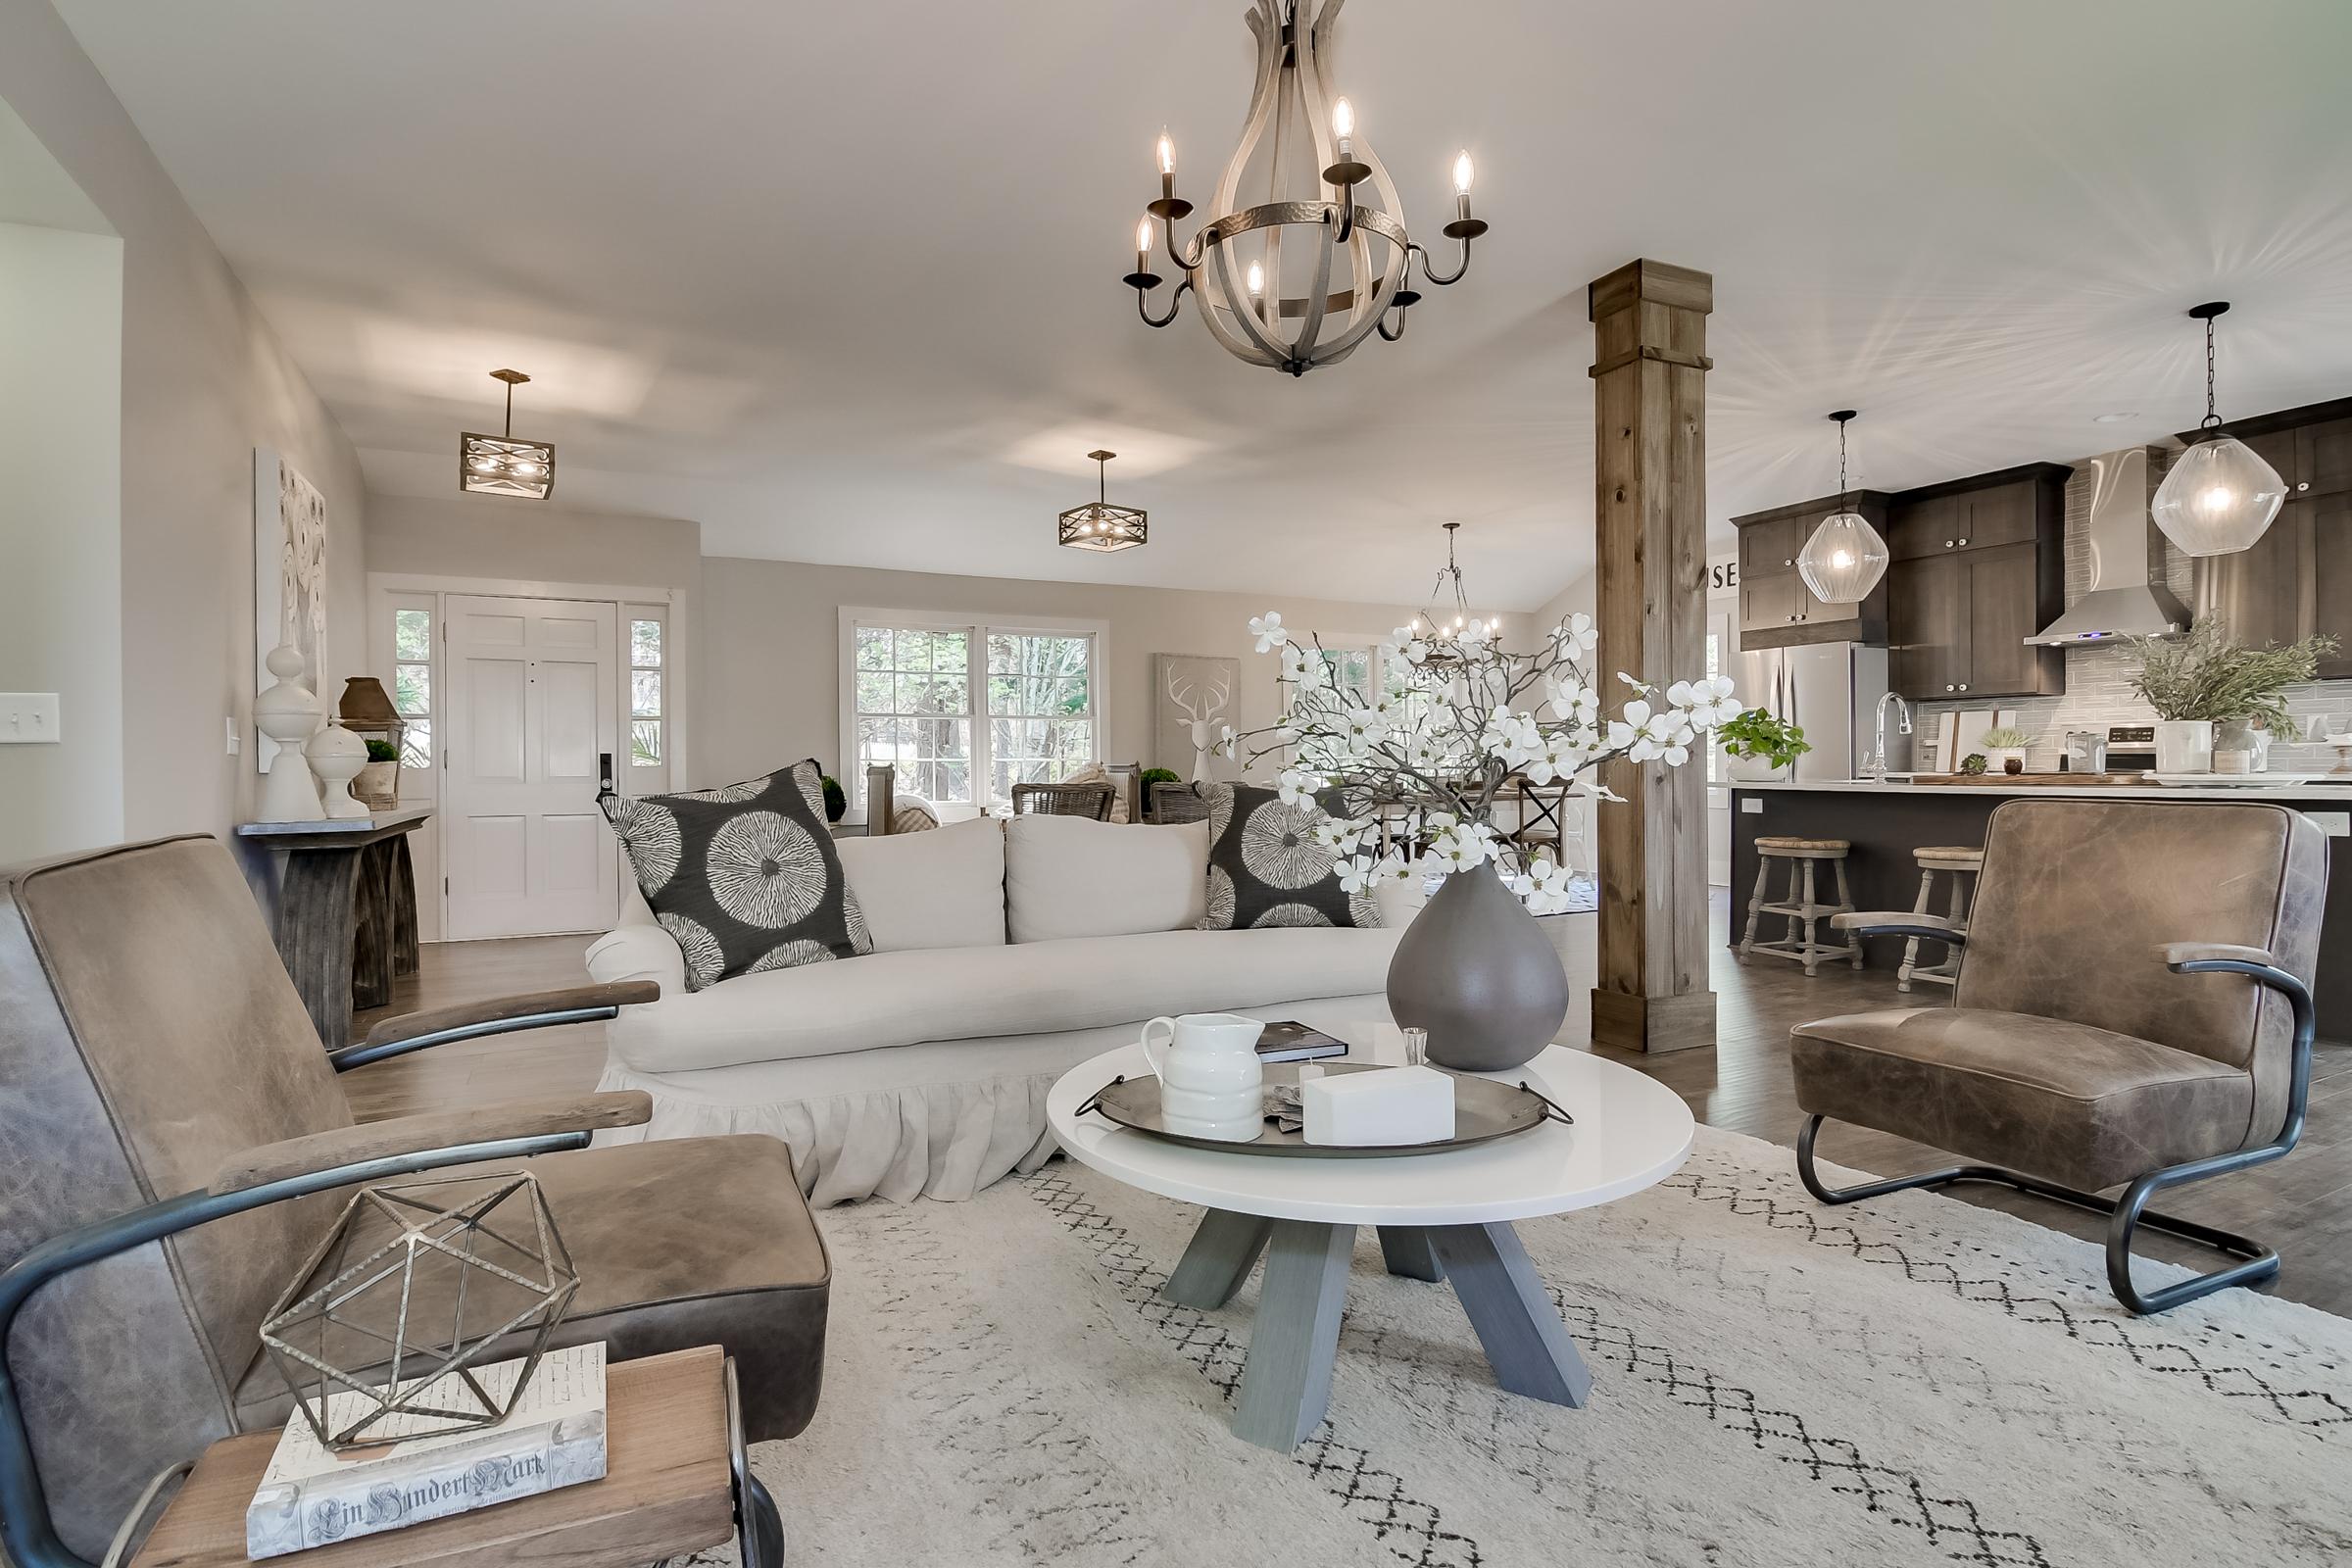 Lighting: Savoy House, Staging: Urban Farmhouse, Custom Furniture: Junc2Funkt, Cabinets: Forevermark Cabinetry, Flooring: Tarkett